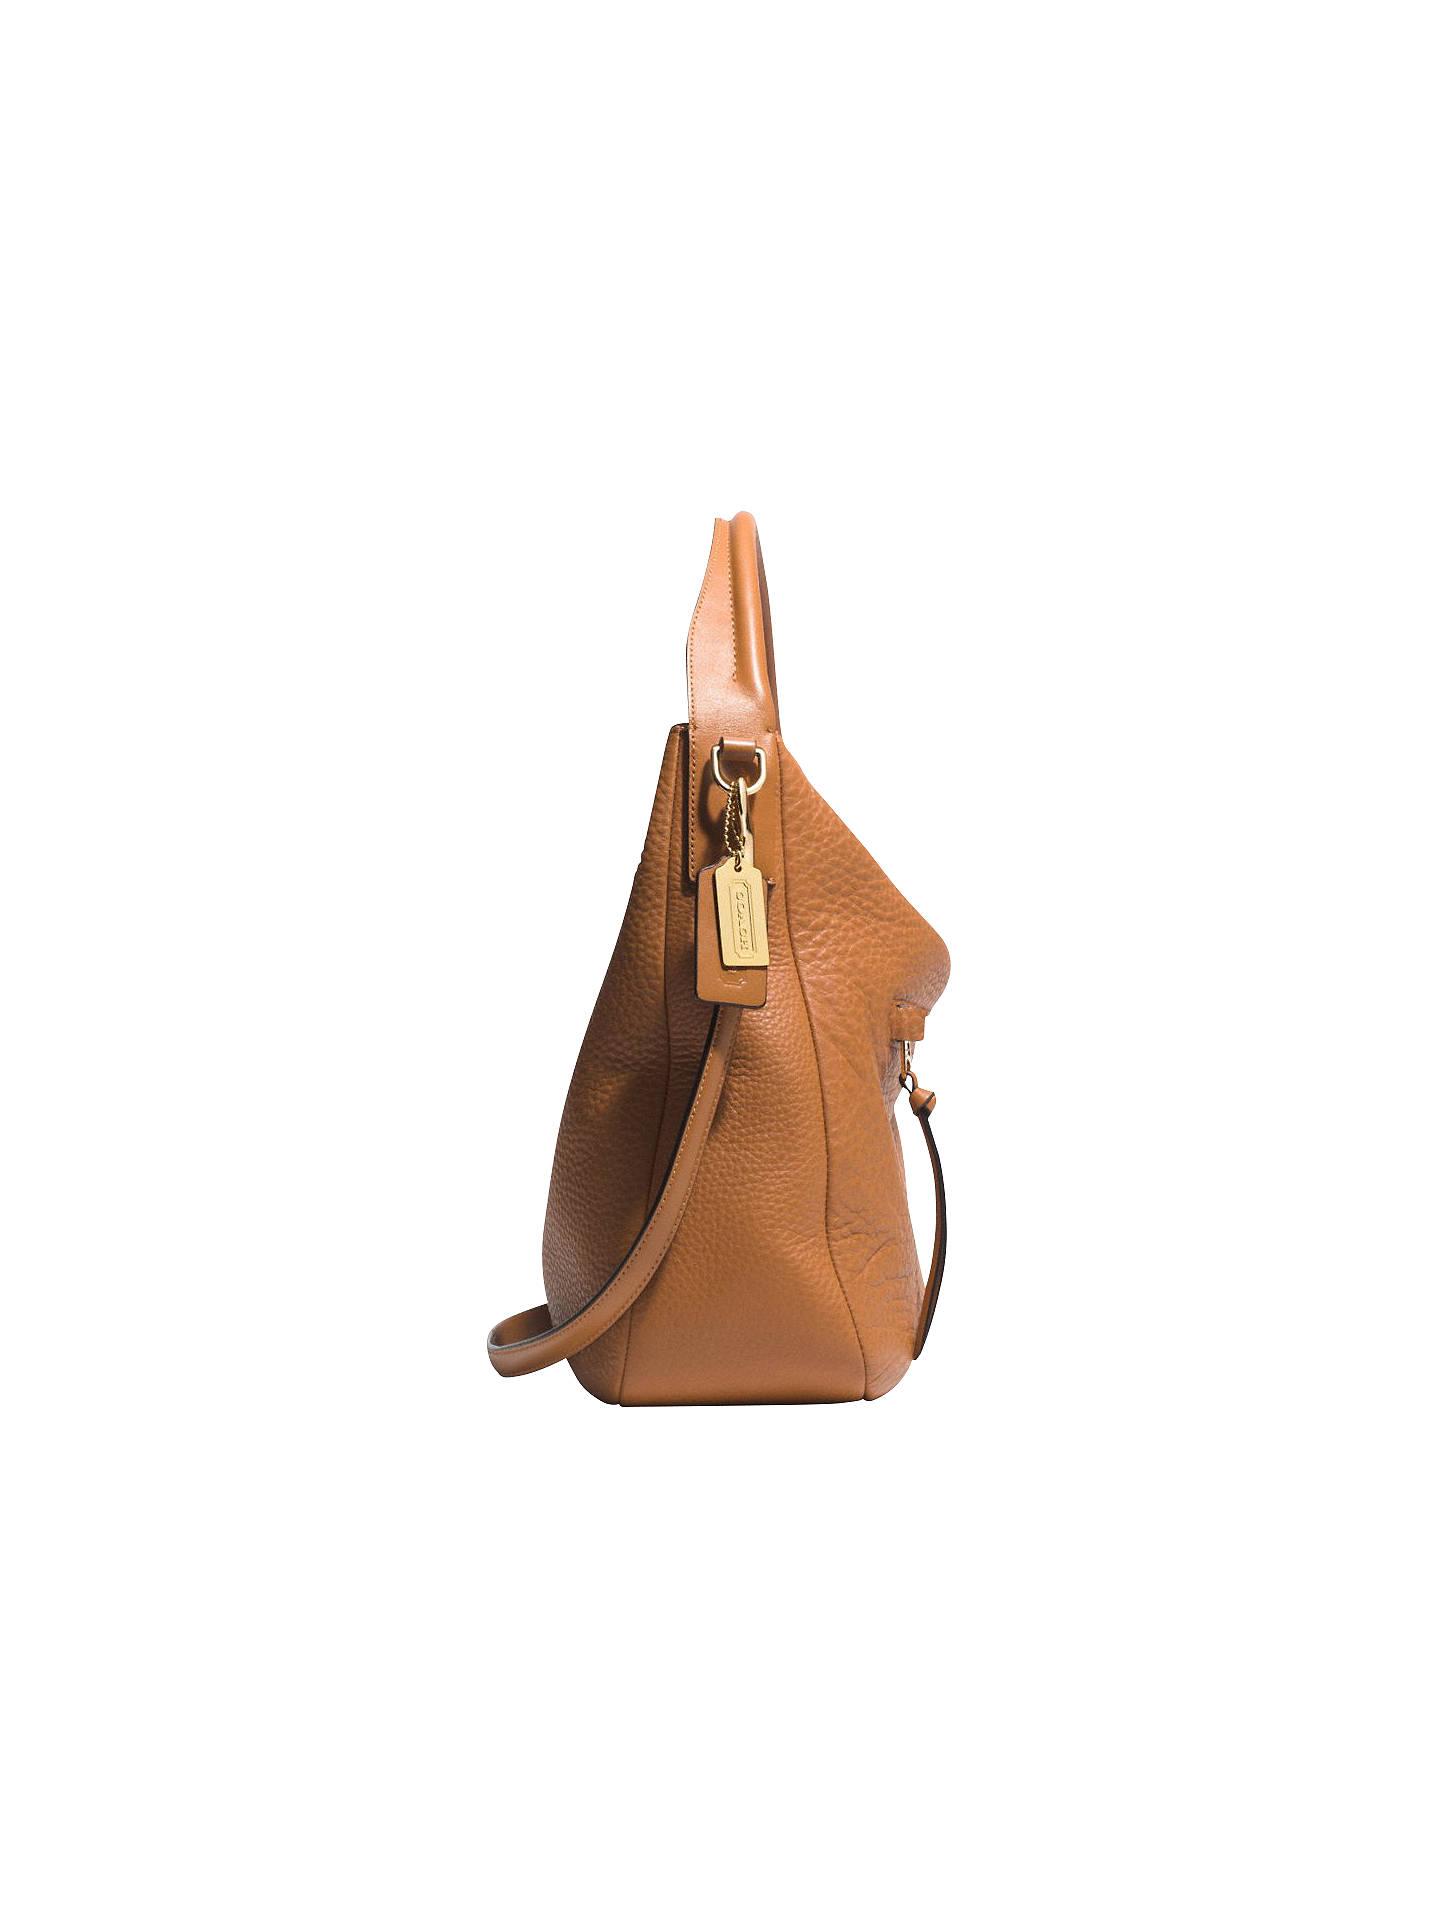 5f97aa4aff ... Buy Coach Bleecker Sullivan Pebbled Leather Hobo Bag